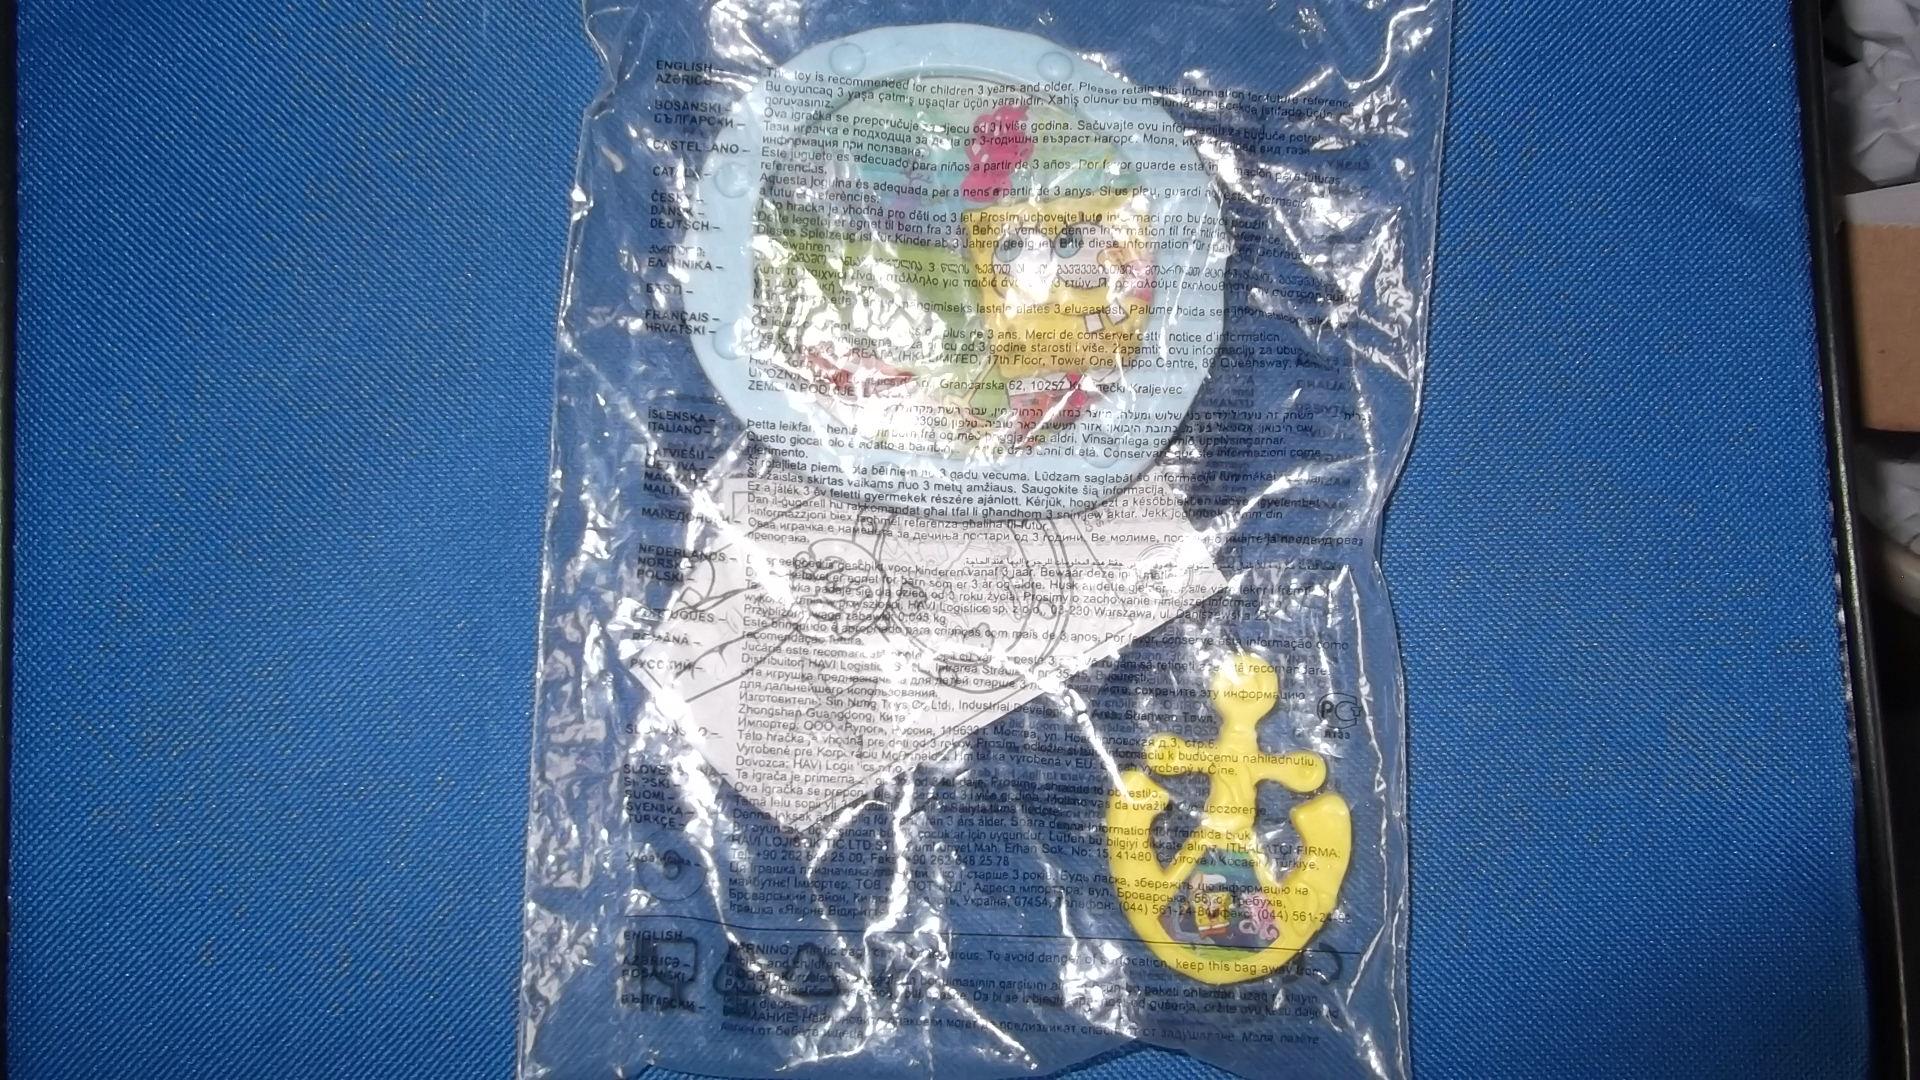 McDonalds Spongebob Squarepants Anchor Jellyfishing Game From 2012 New